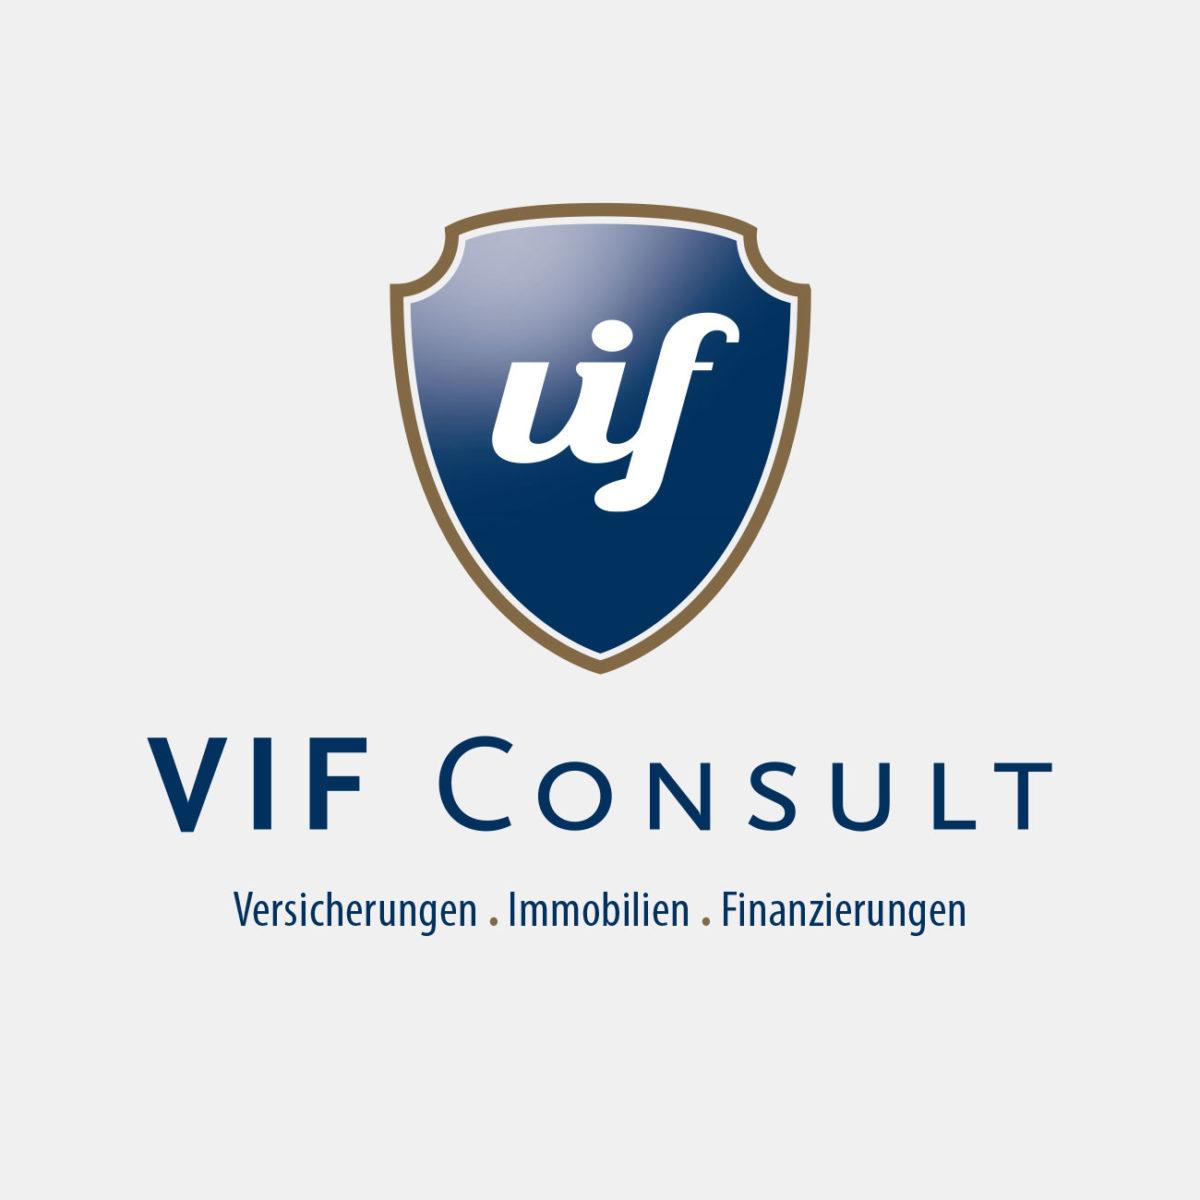 Vif Consult Logodesign